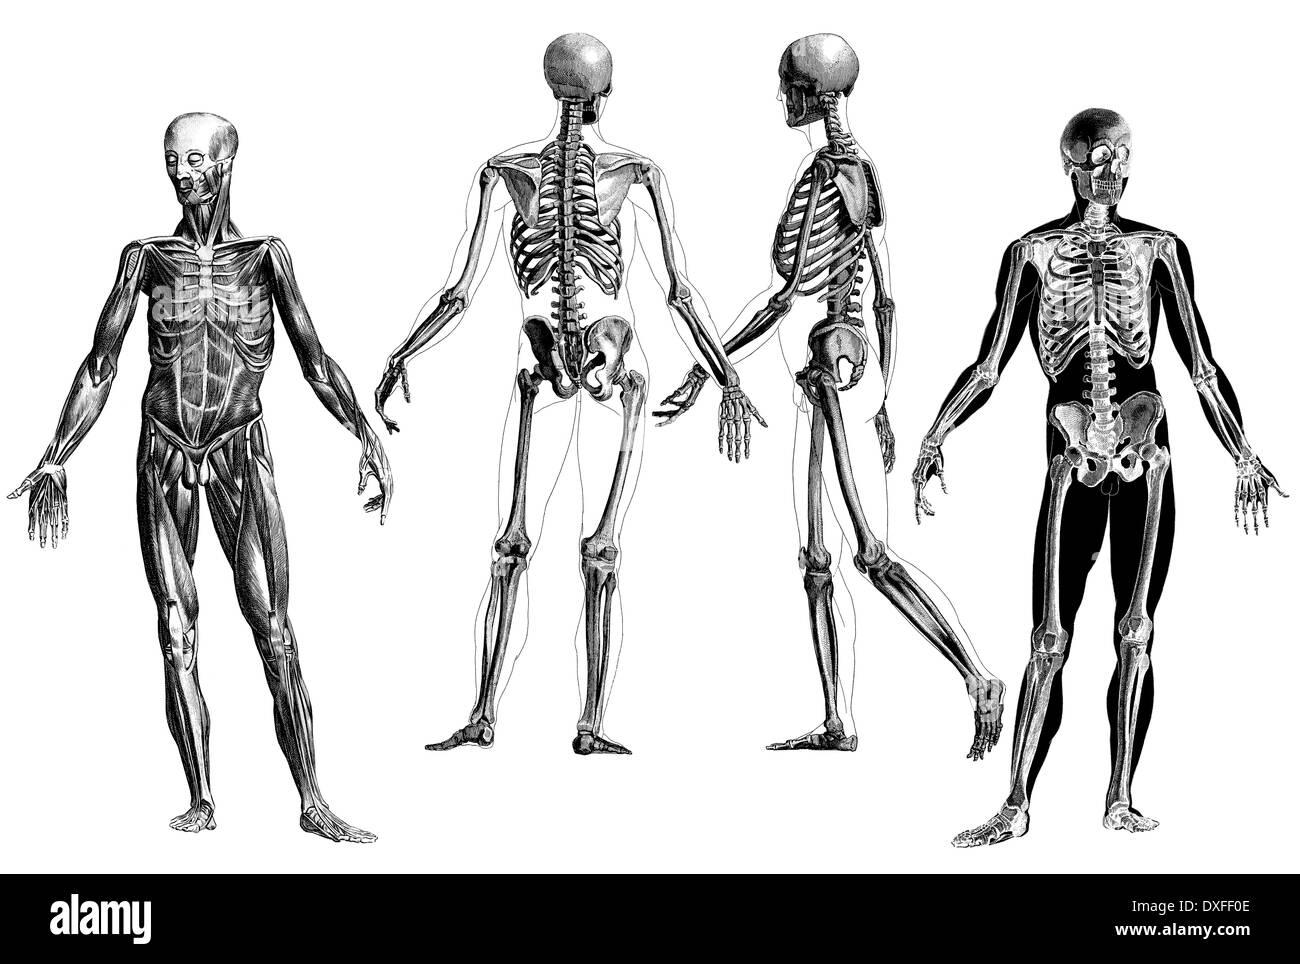 Victorian Anatomical Drawing Stock Photos & Victorian Anatomical ...